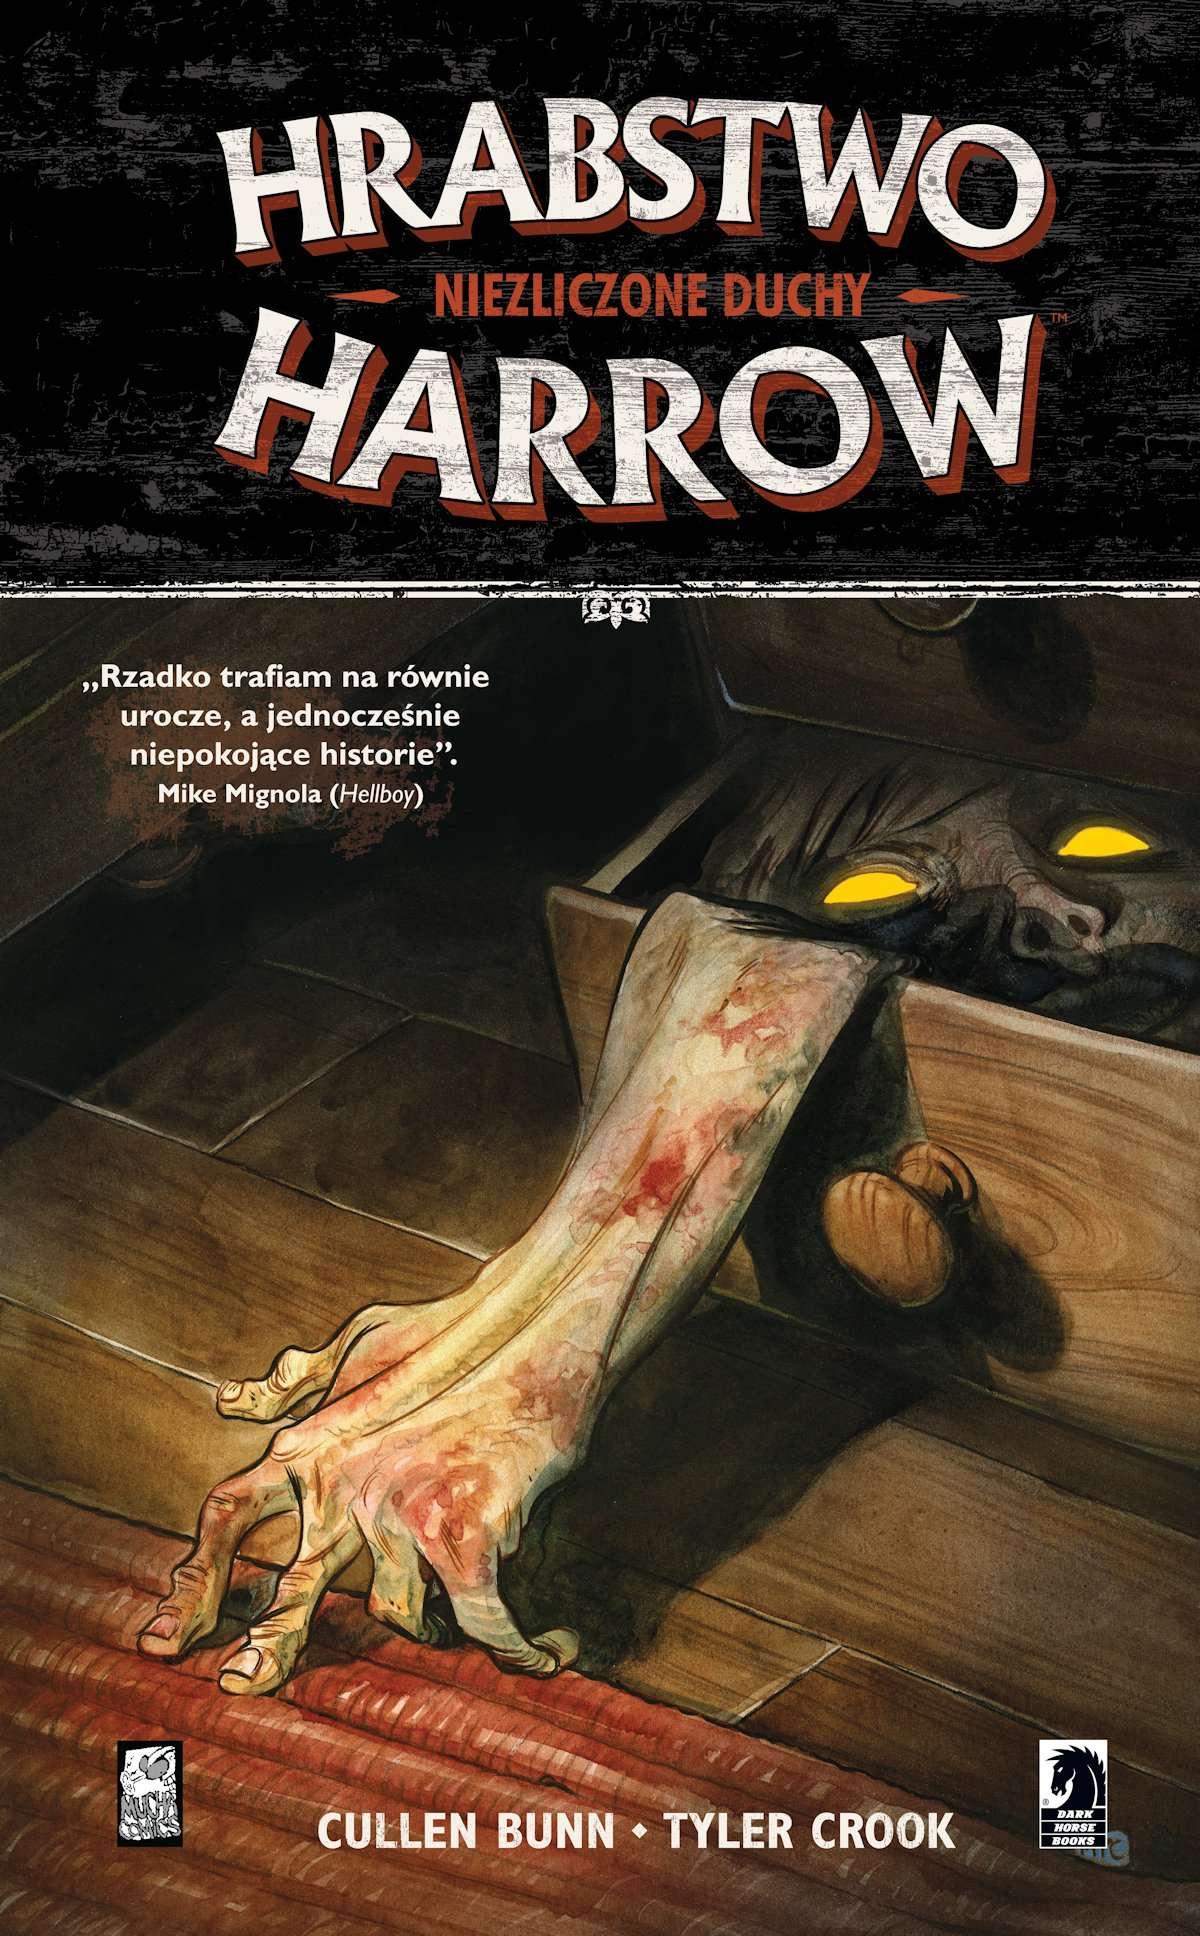 Hrabstwo Harrow: Niezliczone duchy  - full image